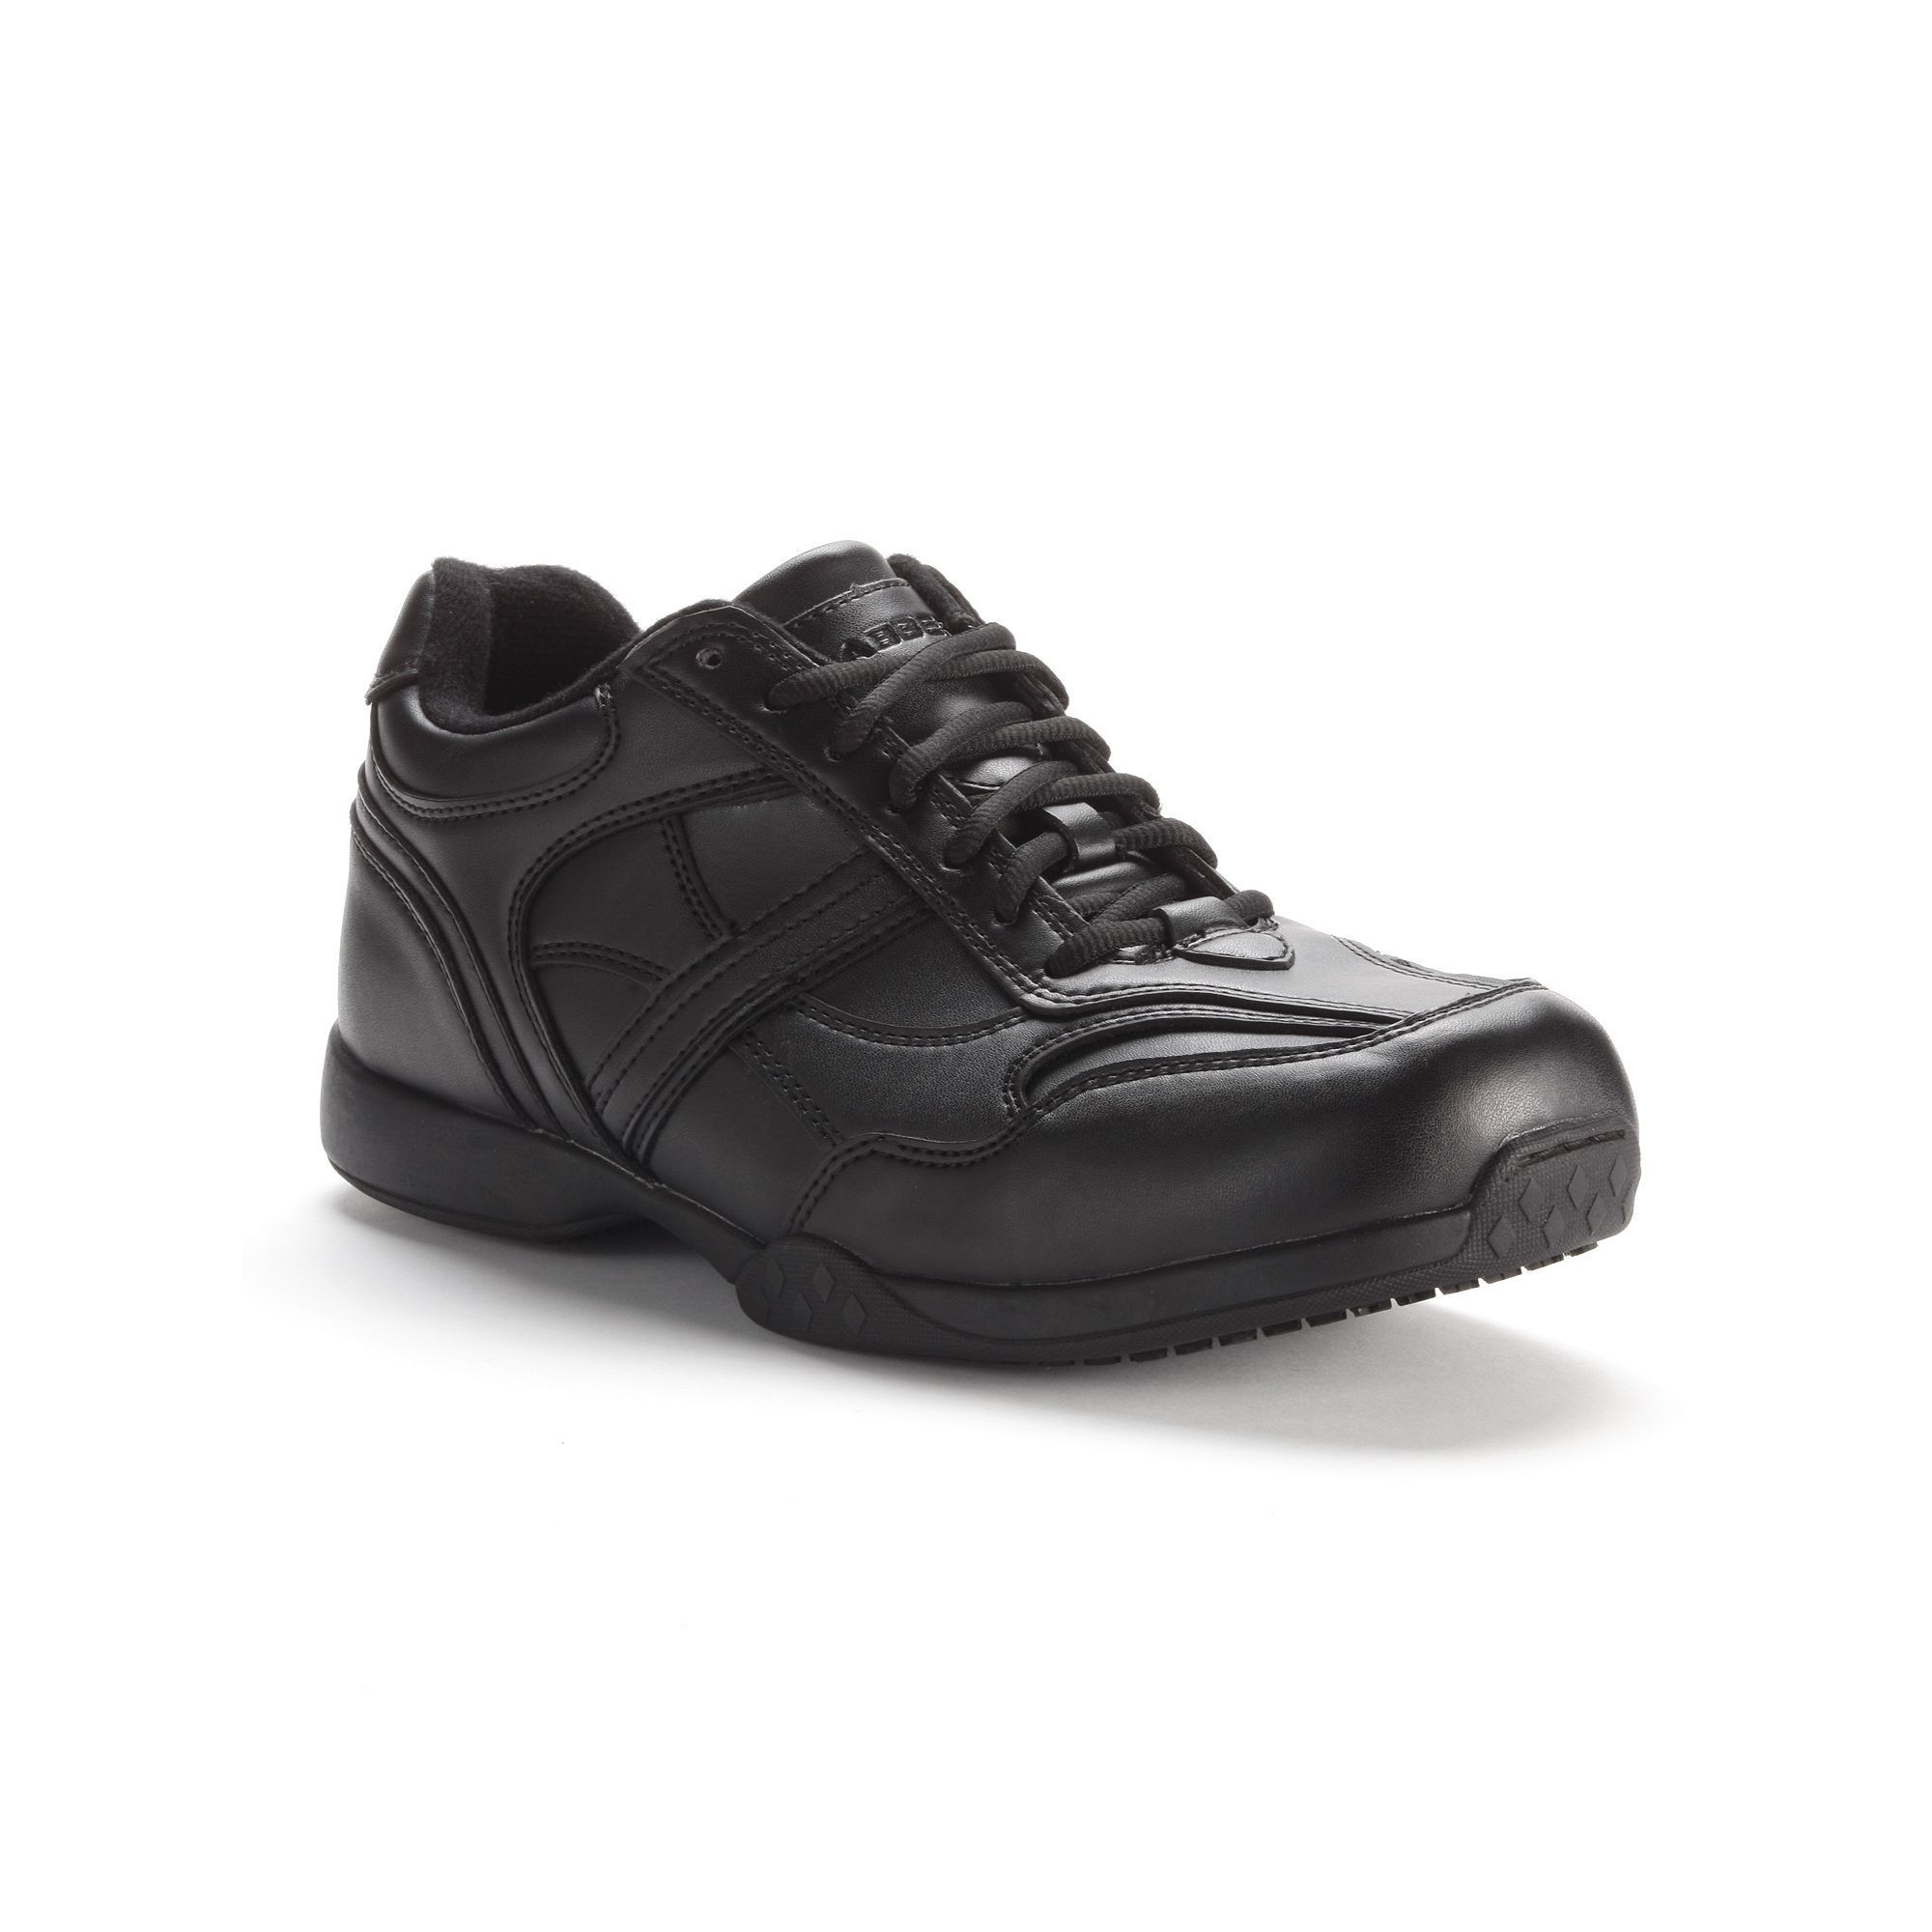 popular cheap price Grabbers Calypso Men's ... Slip-Resistant Euro Oxford Work Shoes free shipping purchase GAJ3o9c